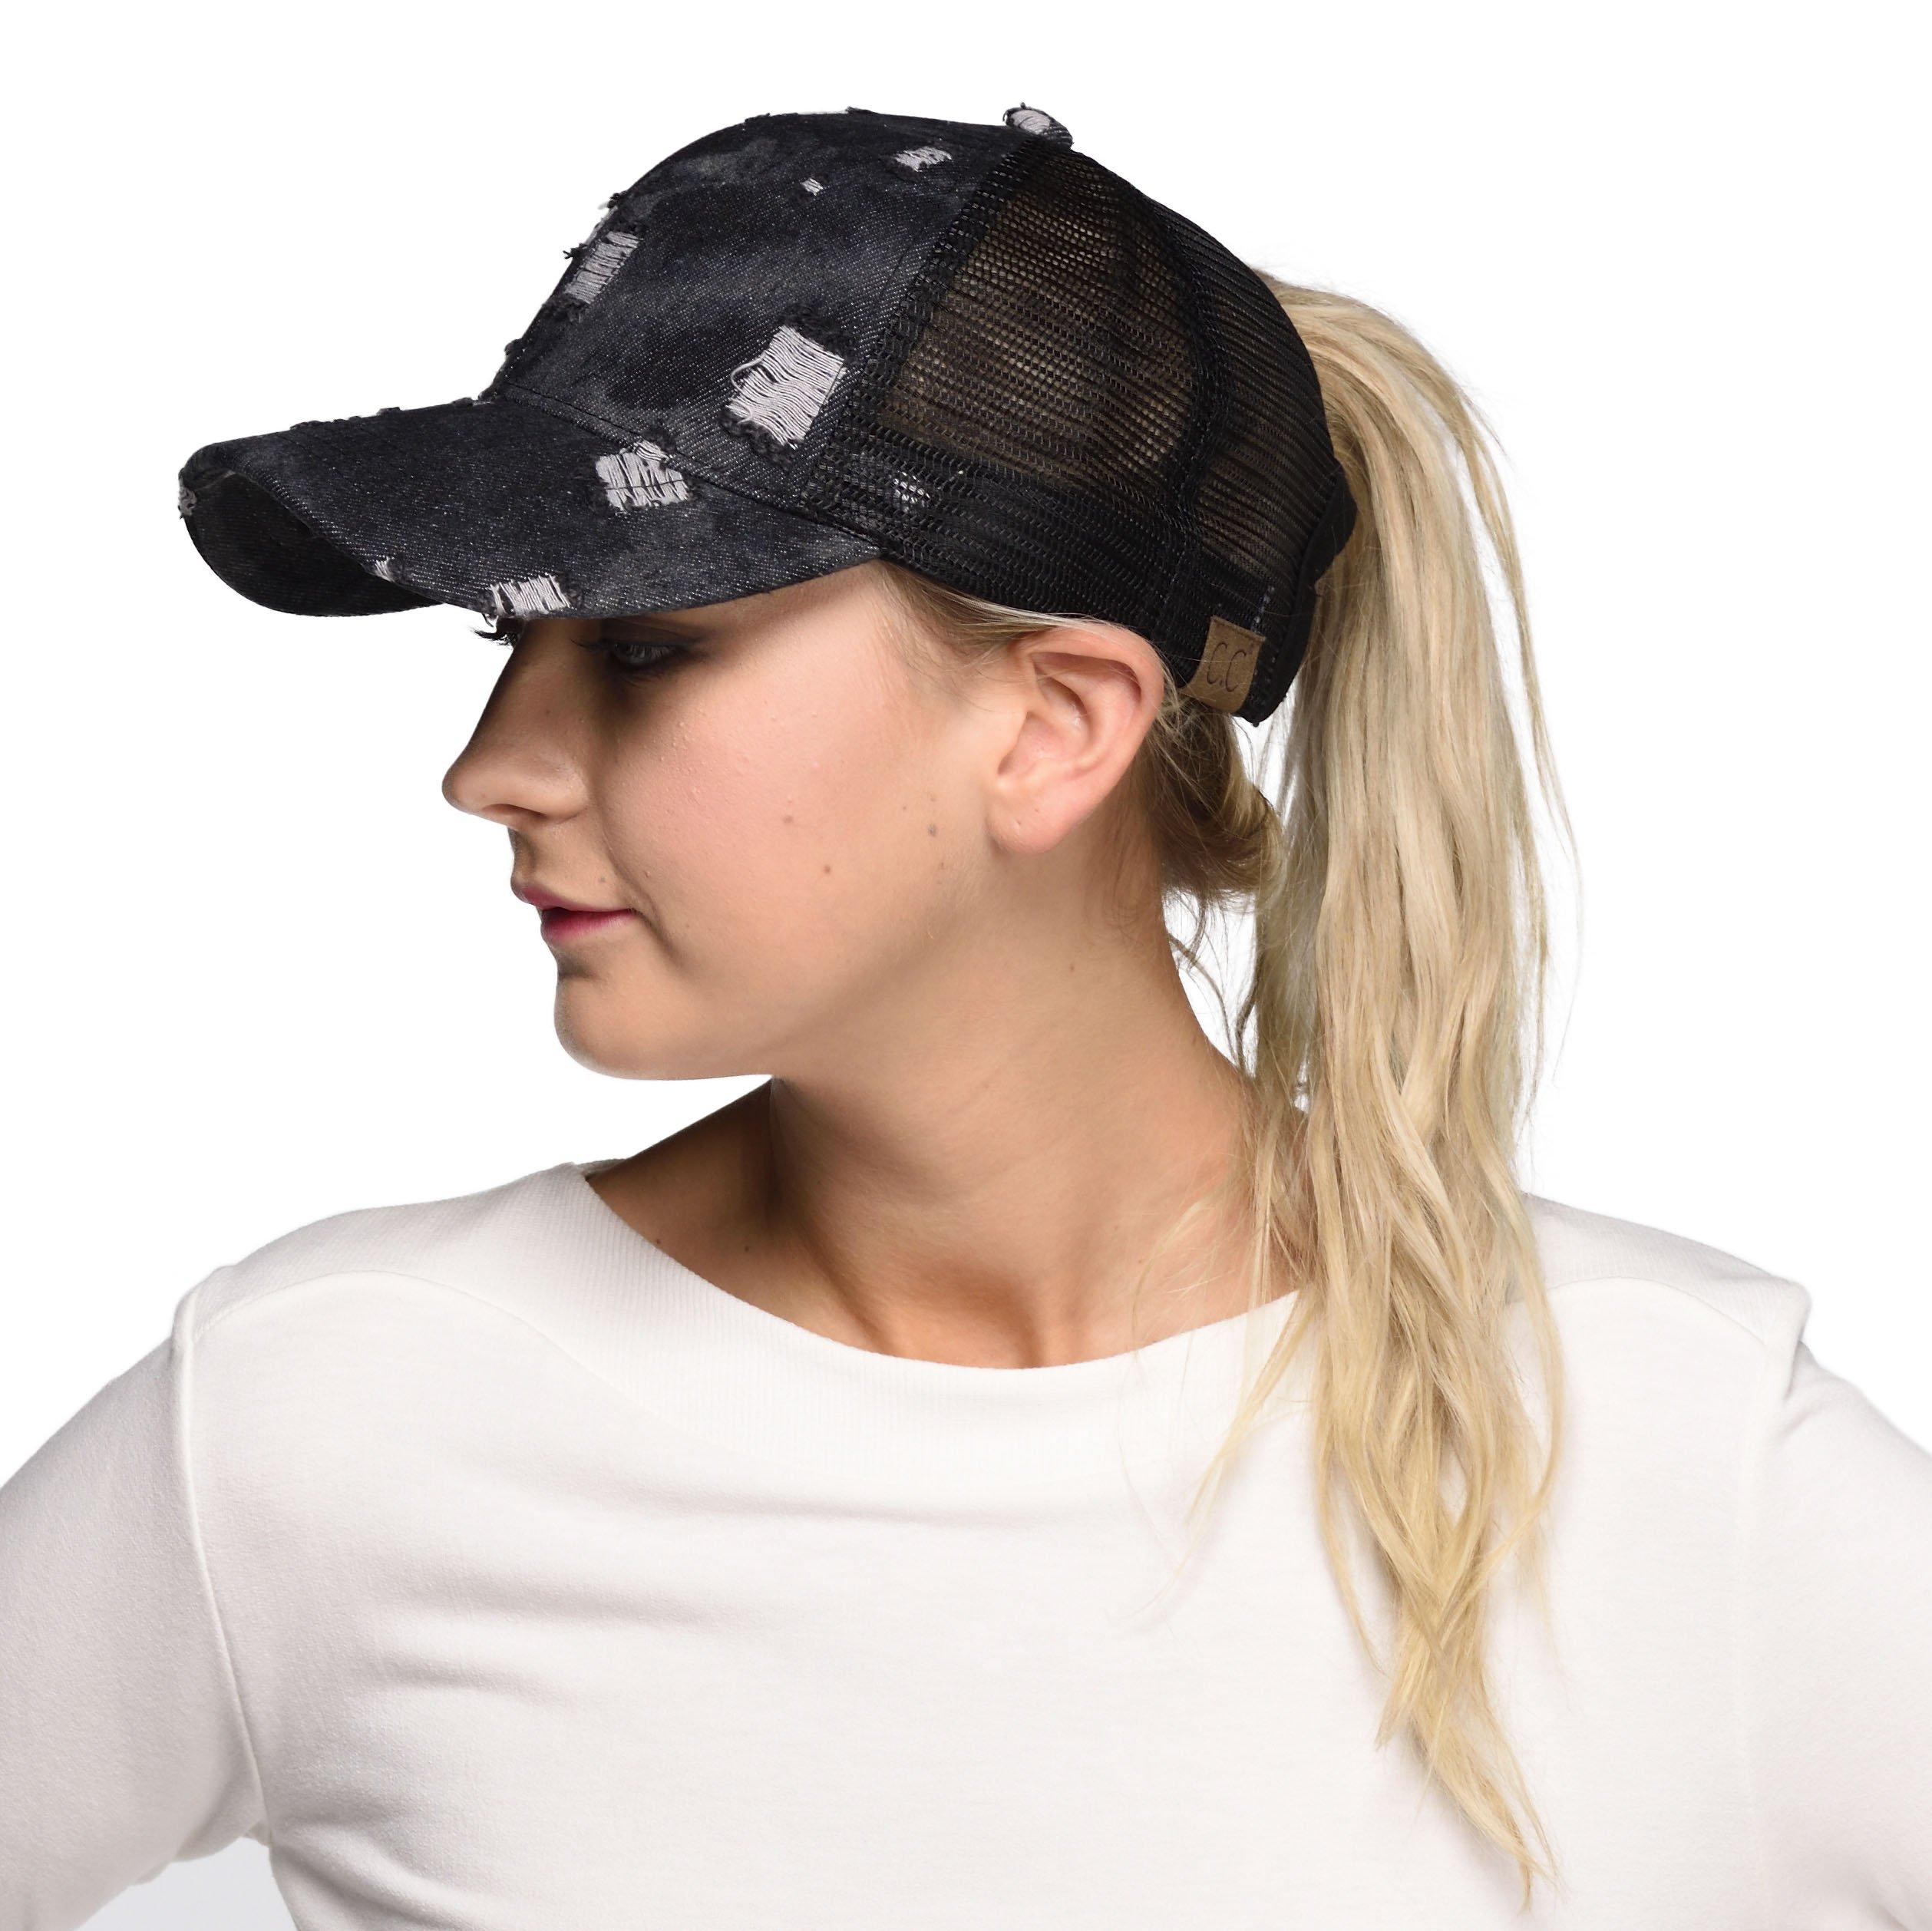 Hatsandscarf C.C Messy Buns Damaged Denim Fabric Trucker Hat with Ponytail Baseball Cap (BT-8) (Black)